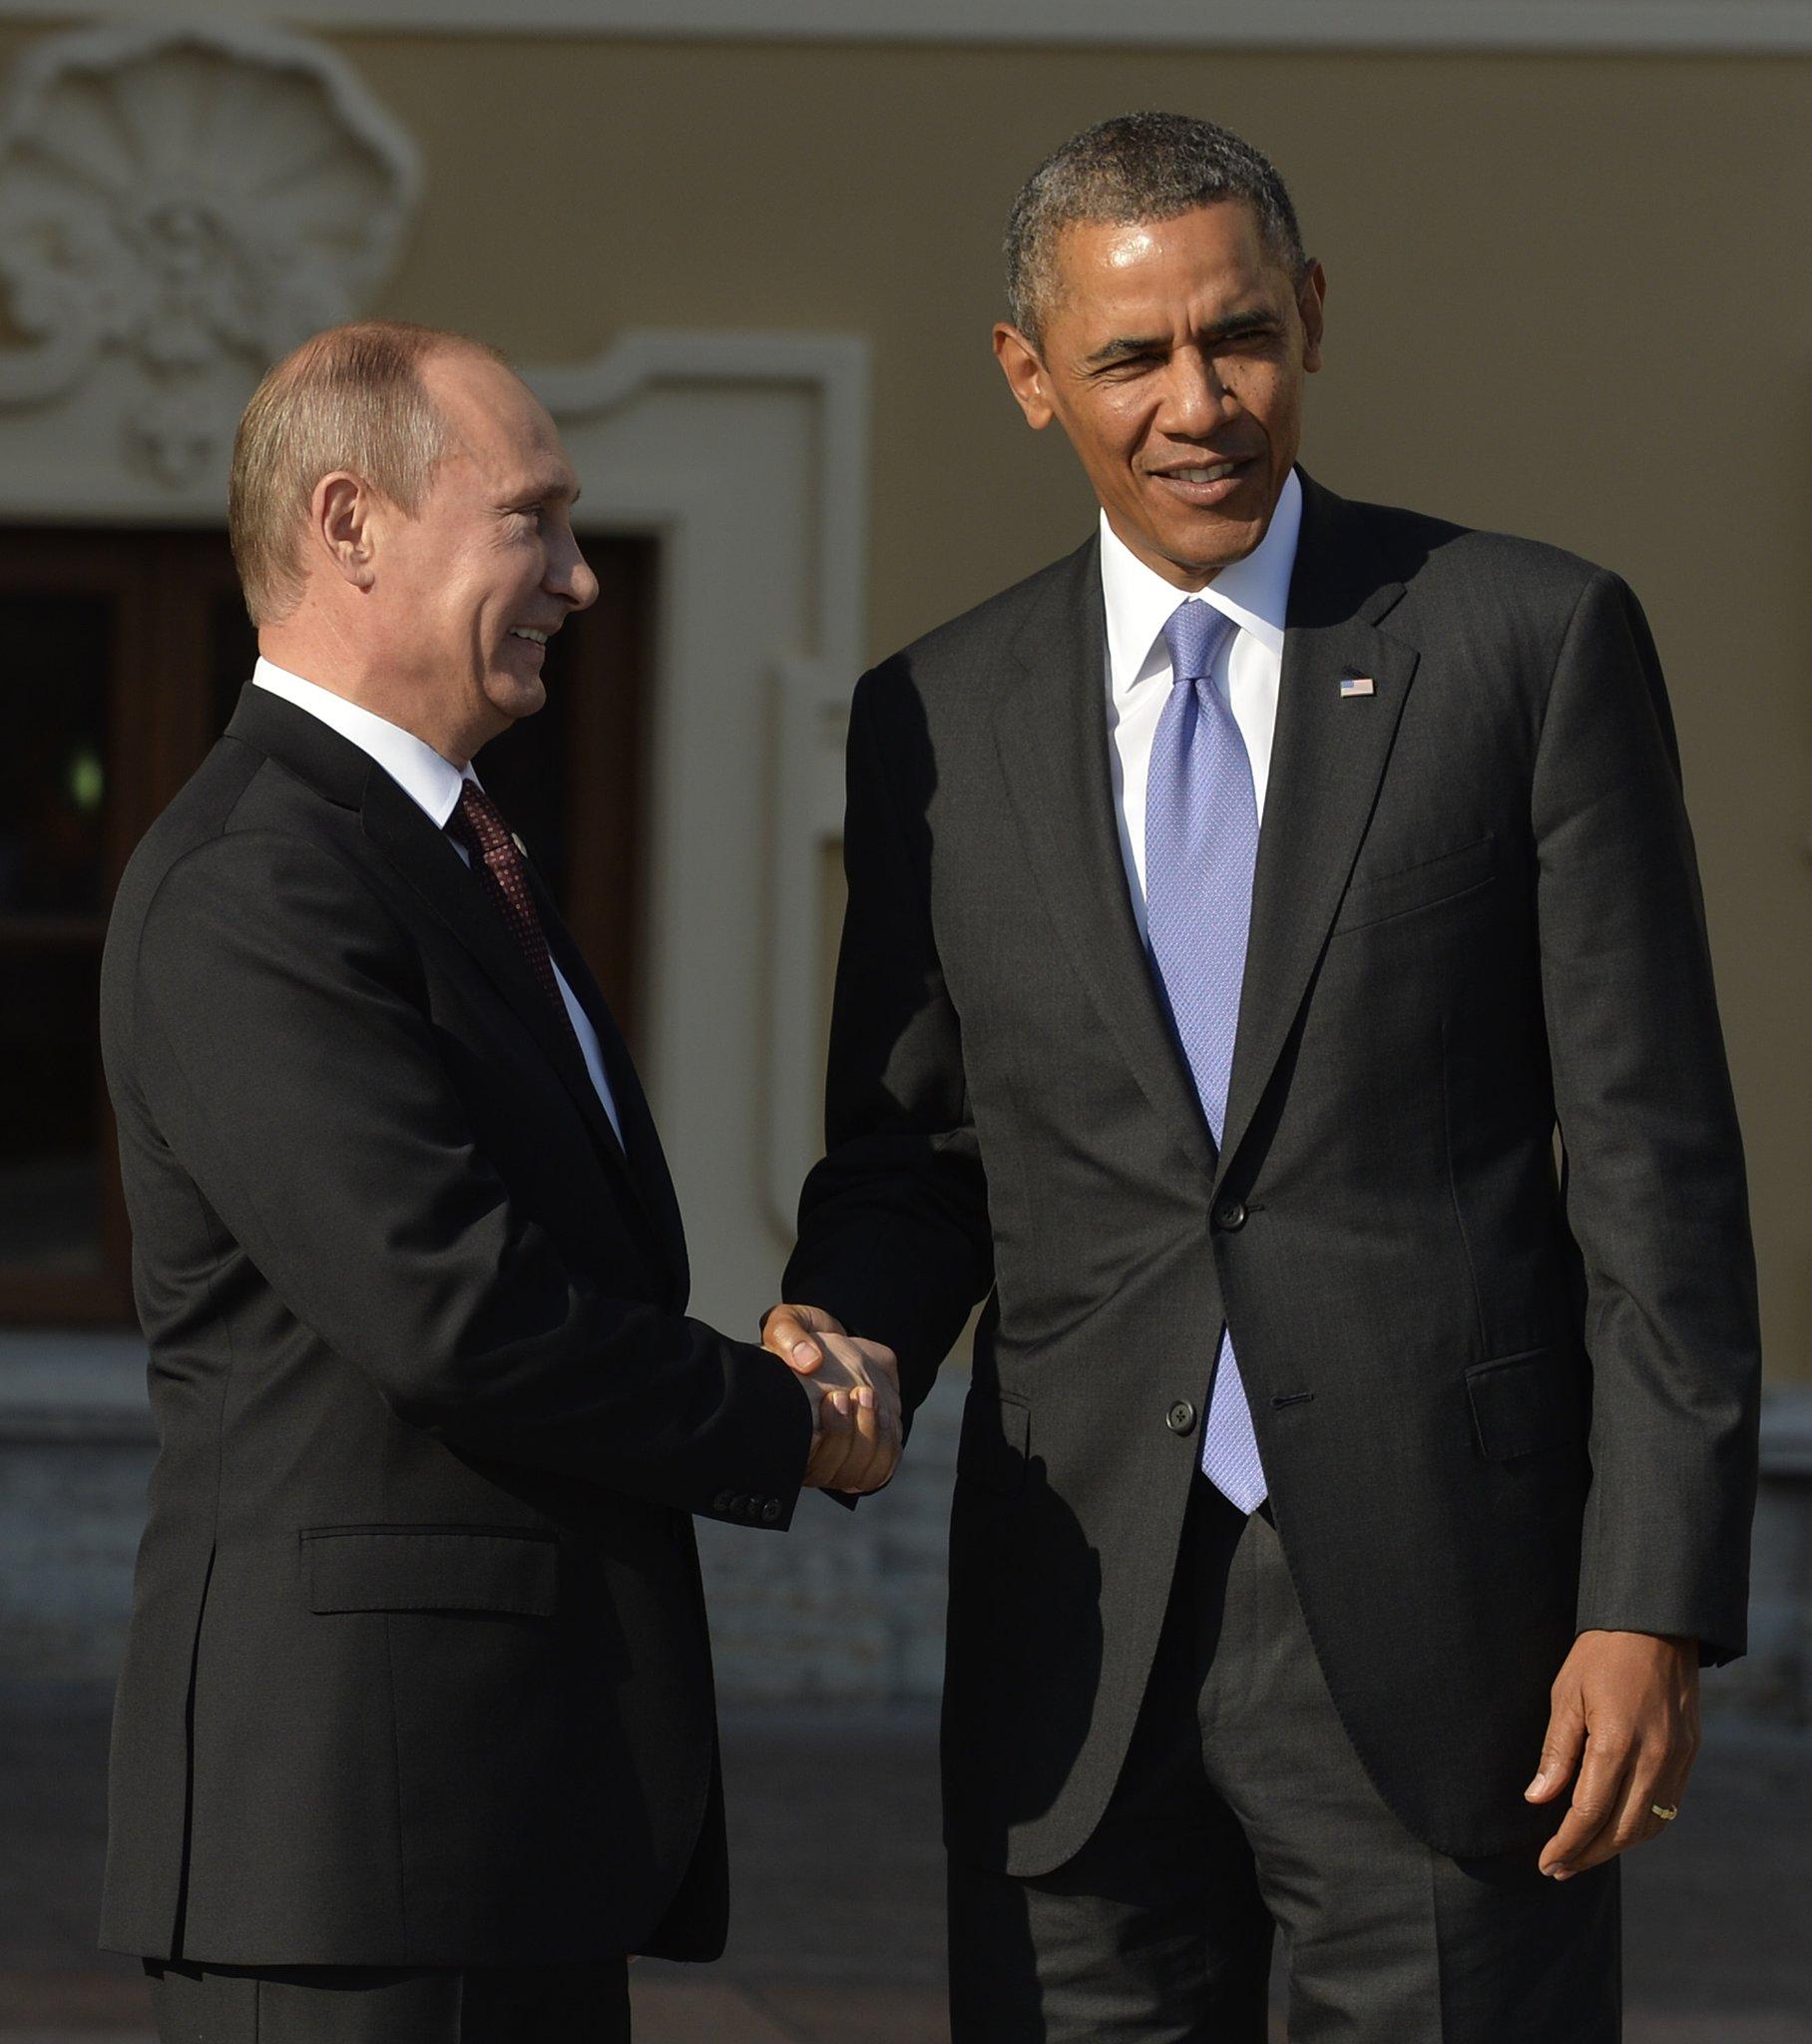 President Barack Obama greeted Russian President Vladimir Putin, the host of the G20 summit.